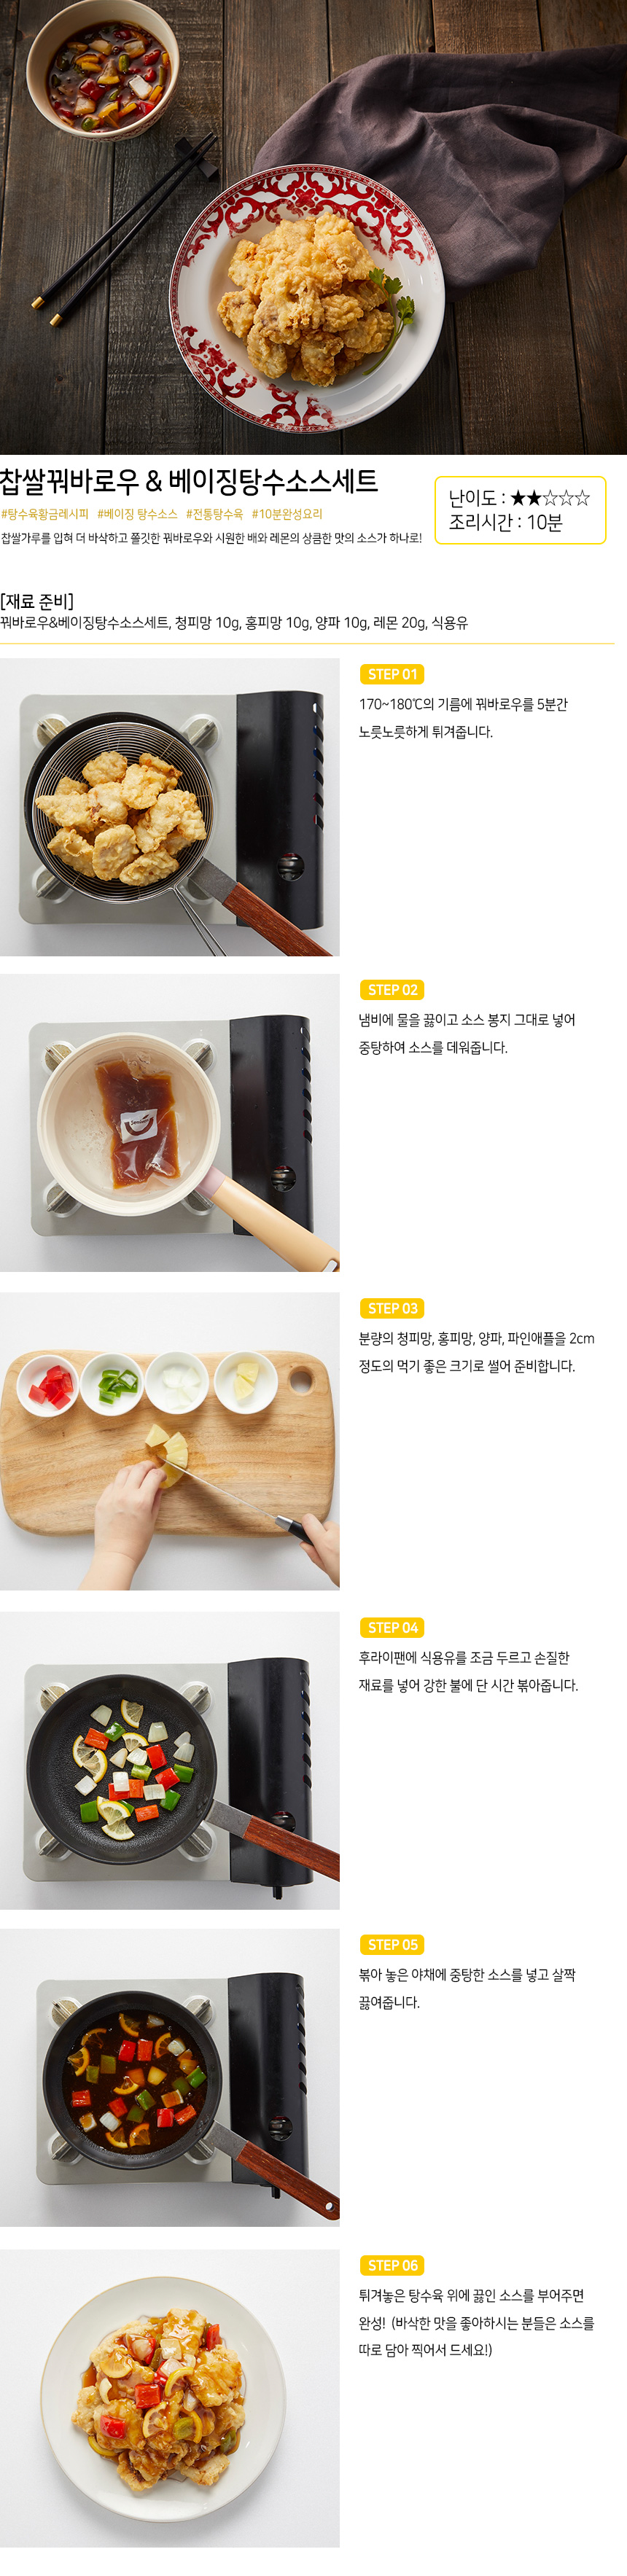 recipe_22114.jpg